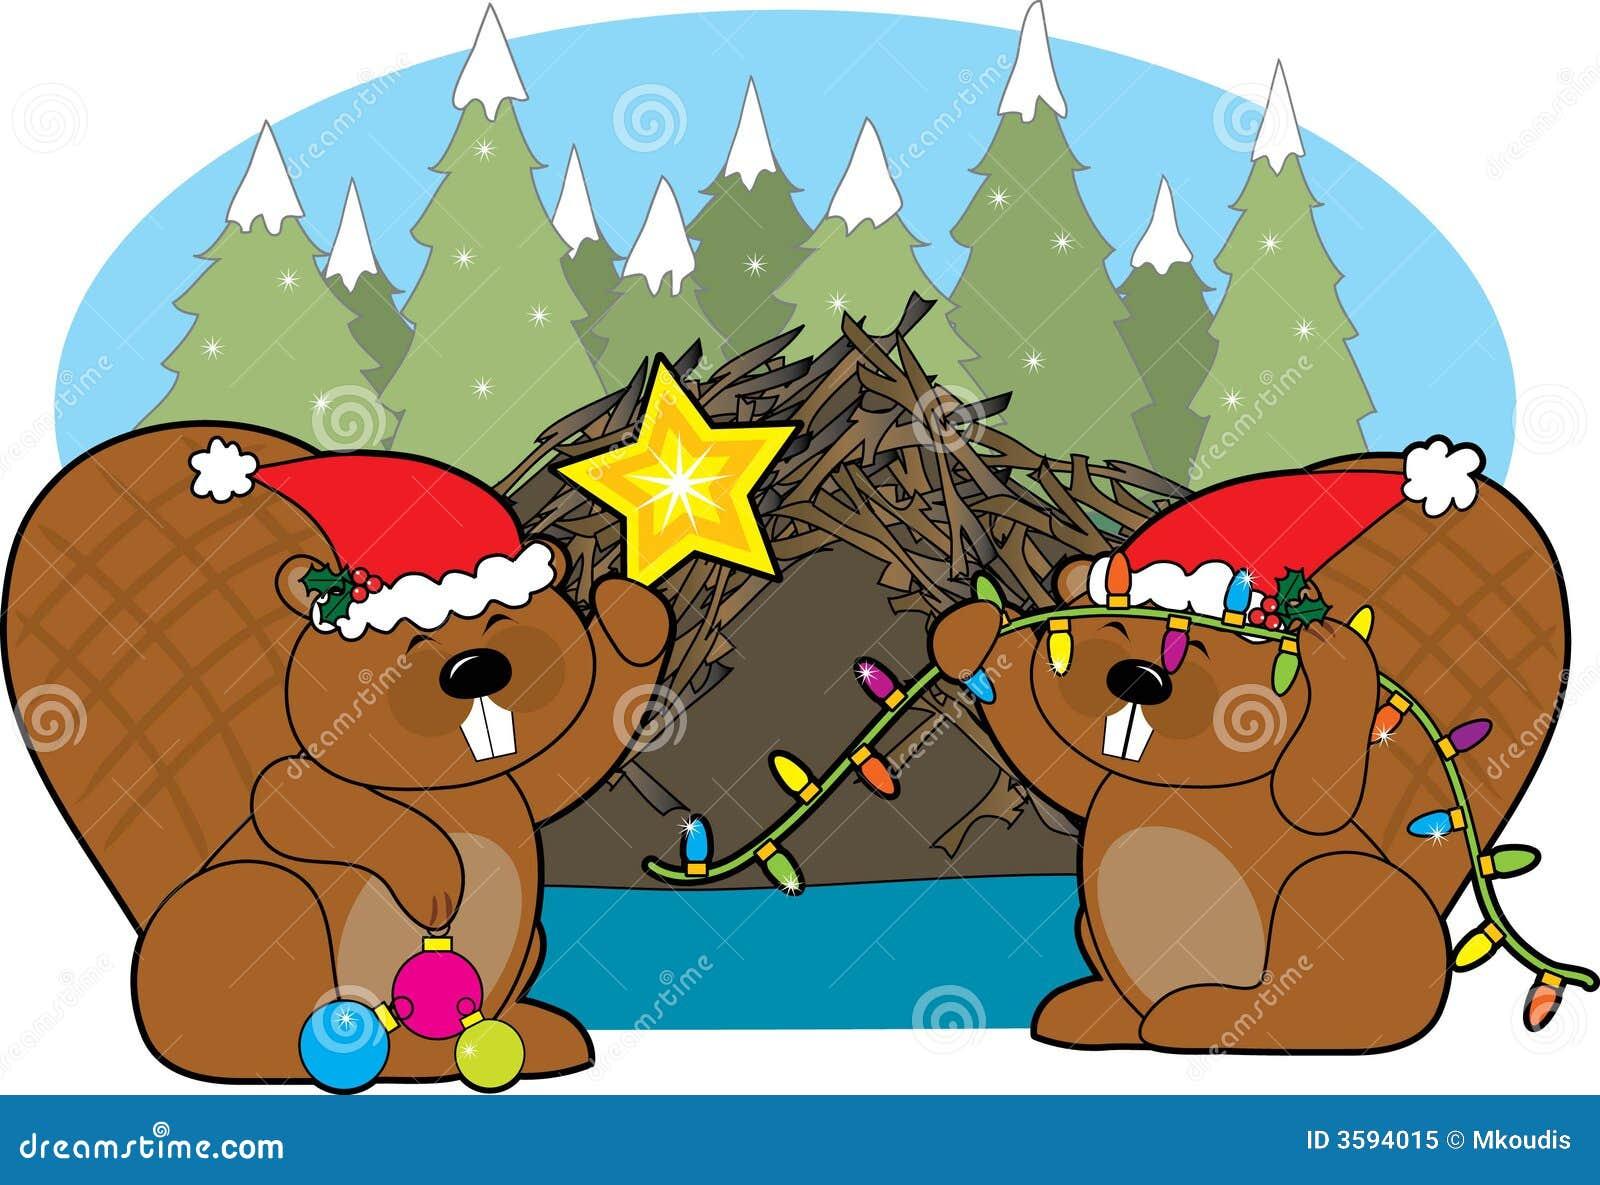 Sell Christmas Trees